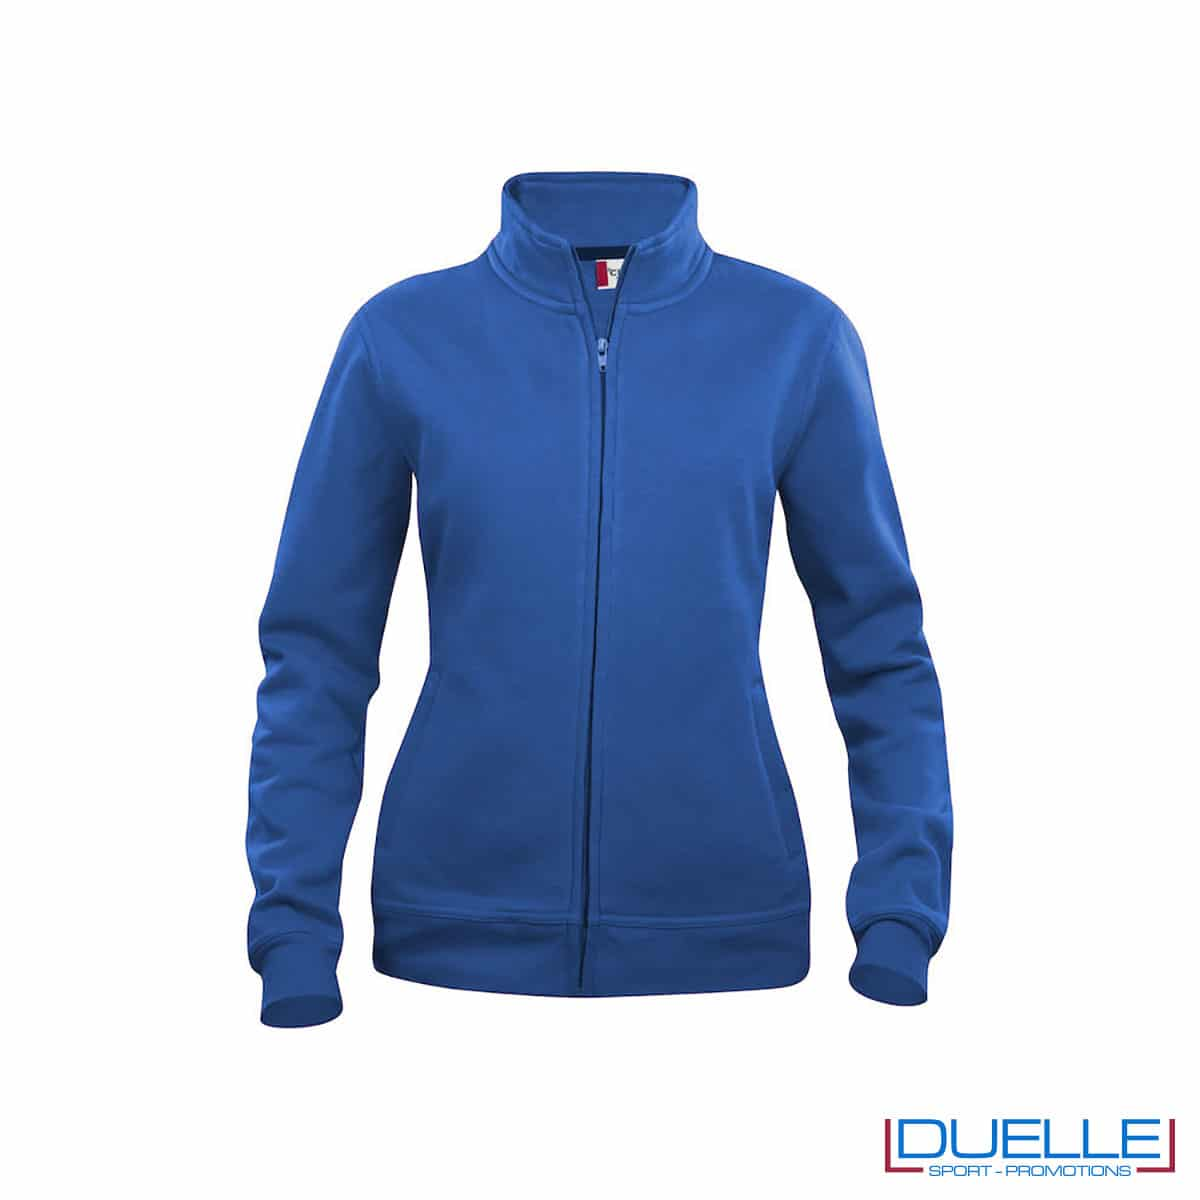 felpa blu royal con zip da donna